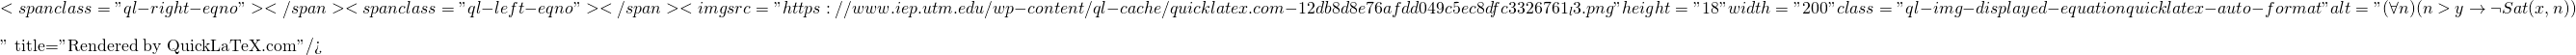 "\[<span class=""ql-right-eqno"">   </span><span class=""ql-left-eqno"">   </span><img src=""https://www.iep.utm.edu/wp-content/ql-cache/quicklatex.com-12db8d8e76afdd049c5ec8dfc3326761_l3.png"" height=""18"" width=""200"" class=""ql-img-displayed-equation quicklatex-auto-format"" alt=""\begin{equation*} (\forall n)(n > y \rightarrow \neg Sat(x, n)) \end{equation*}"" title=""Rendered by QuickLaTeX.com""/>\]"